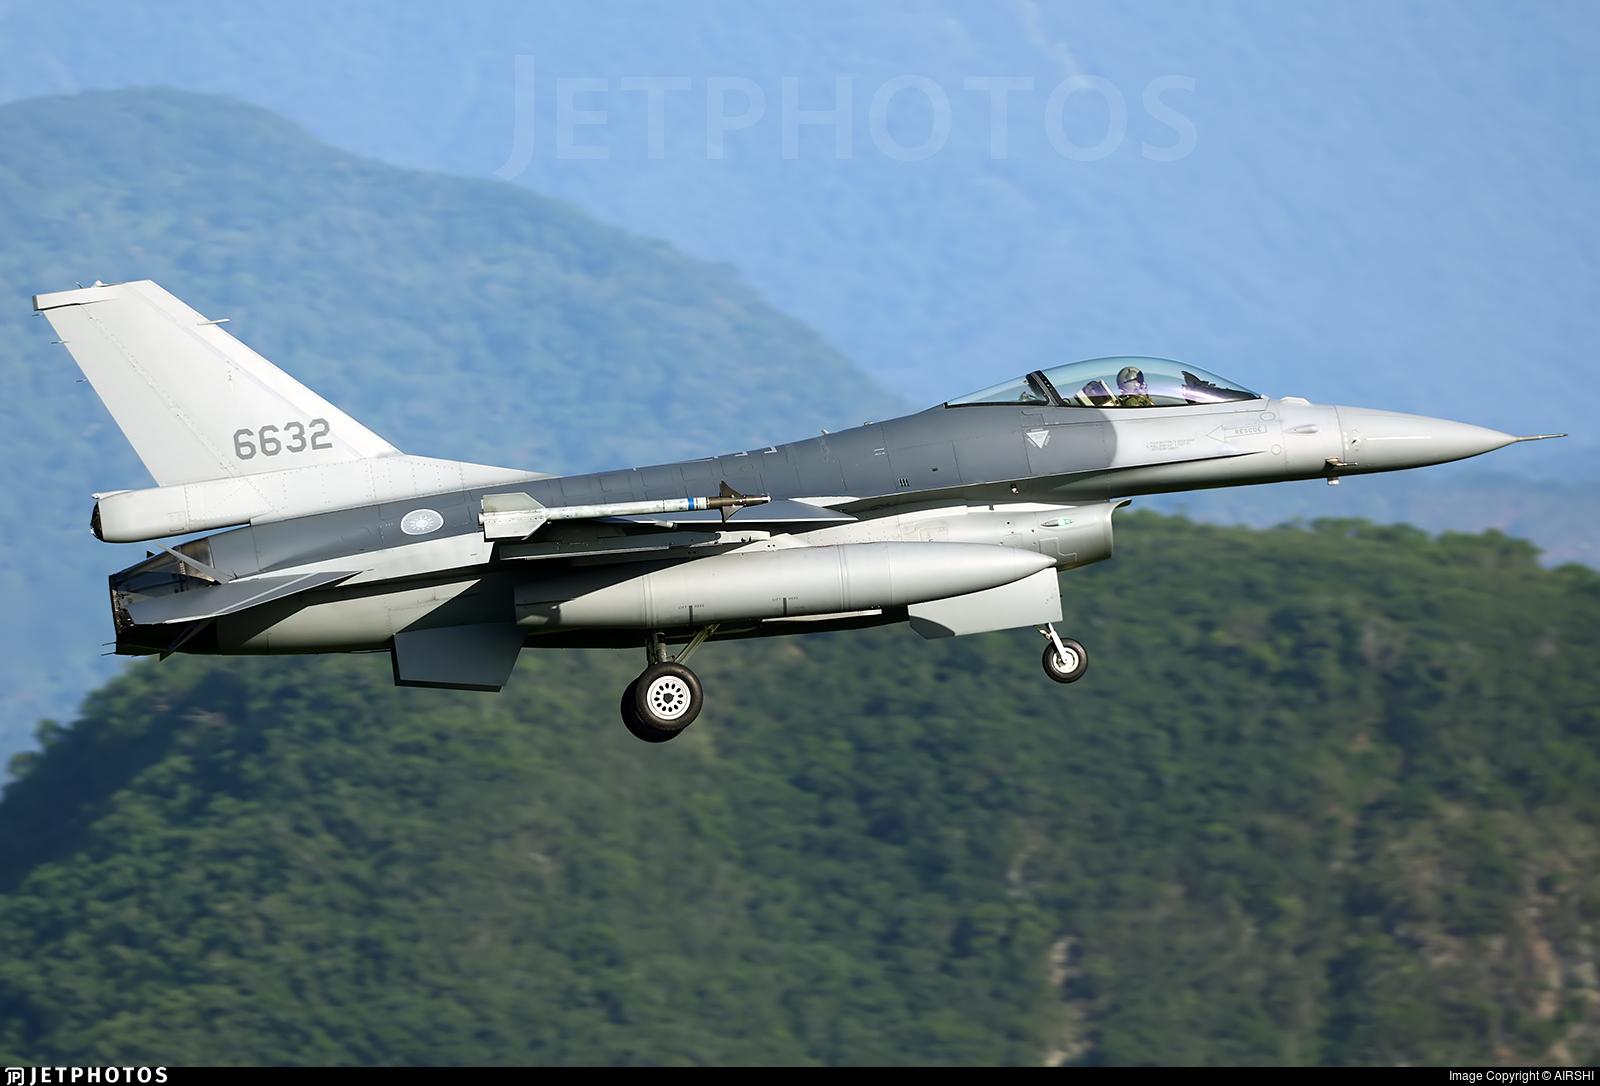 6632 - General Dynamics F-16AM Fighting Falcon - Taiwan - Air Force